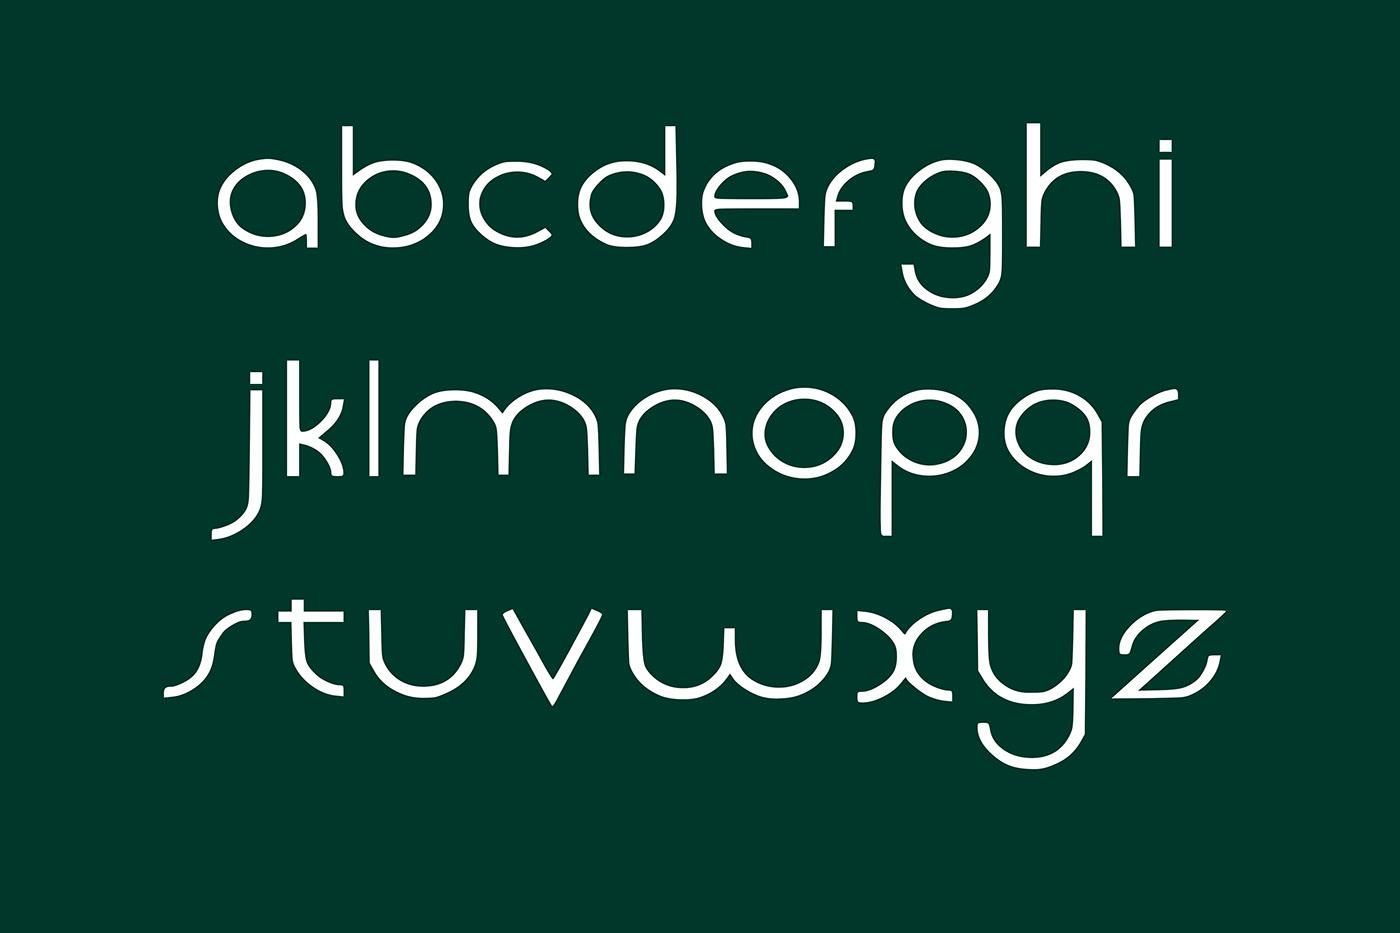 Noga Free Font - sans-serif